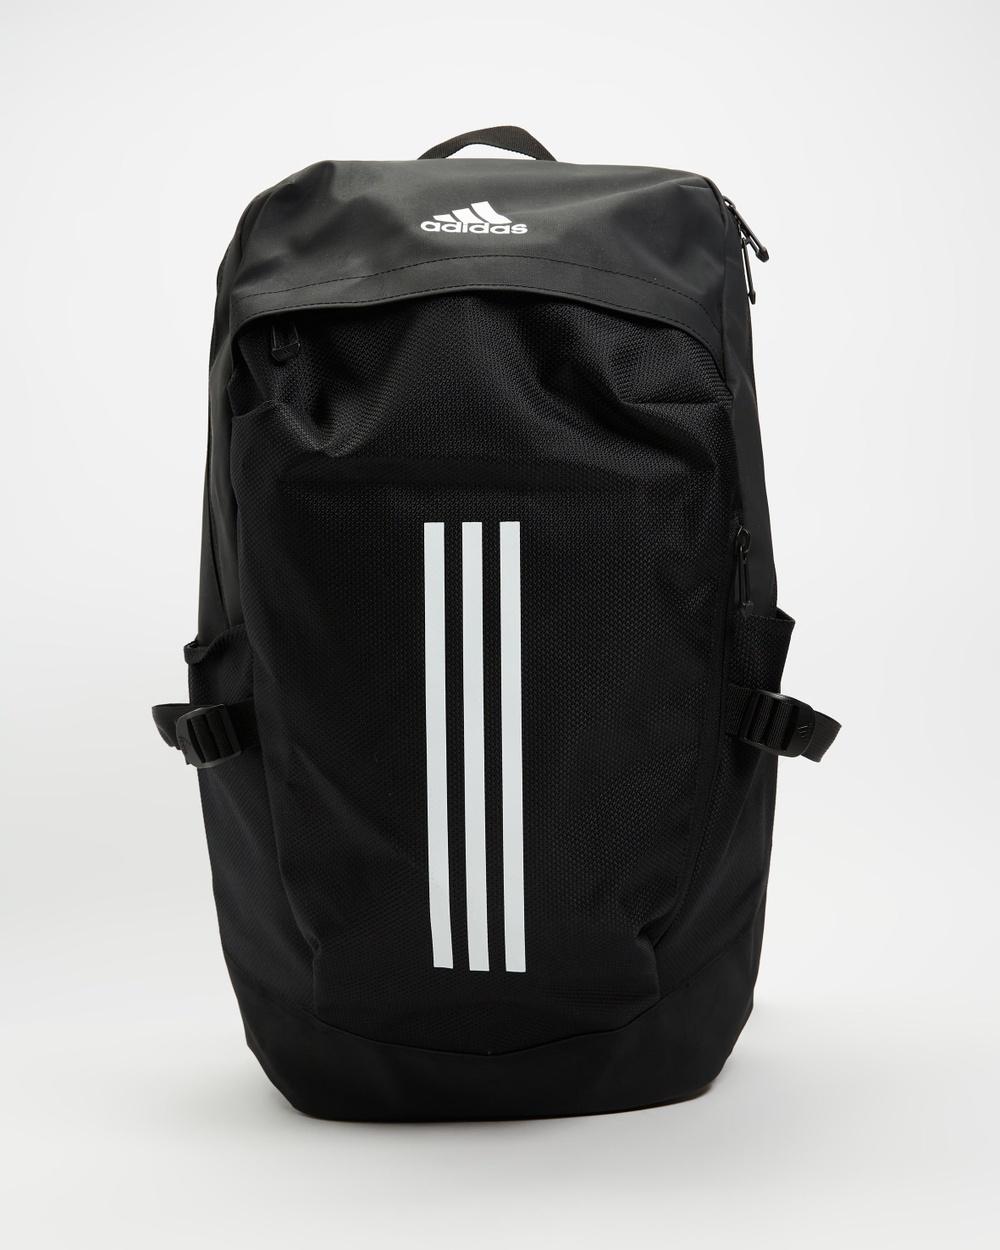 adidas Performance Endurance Packing System Backpack 30L Backpacks Black & White